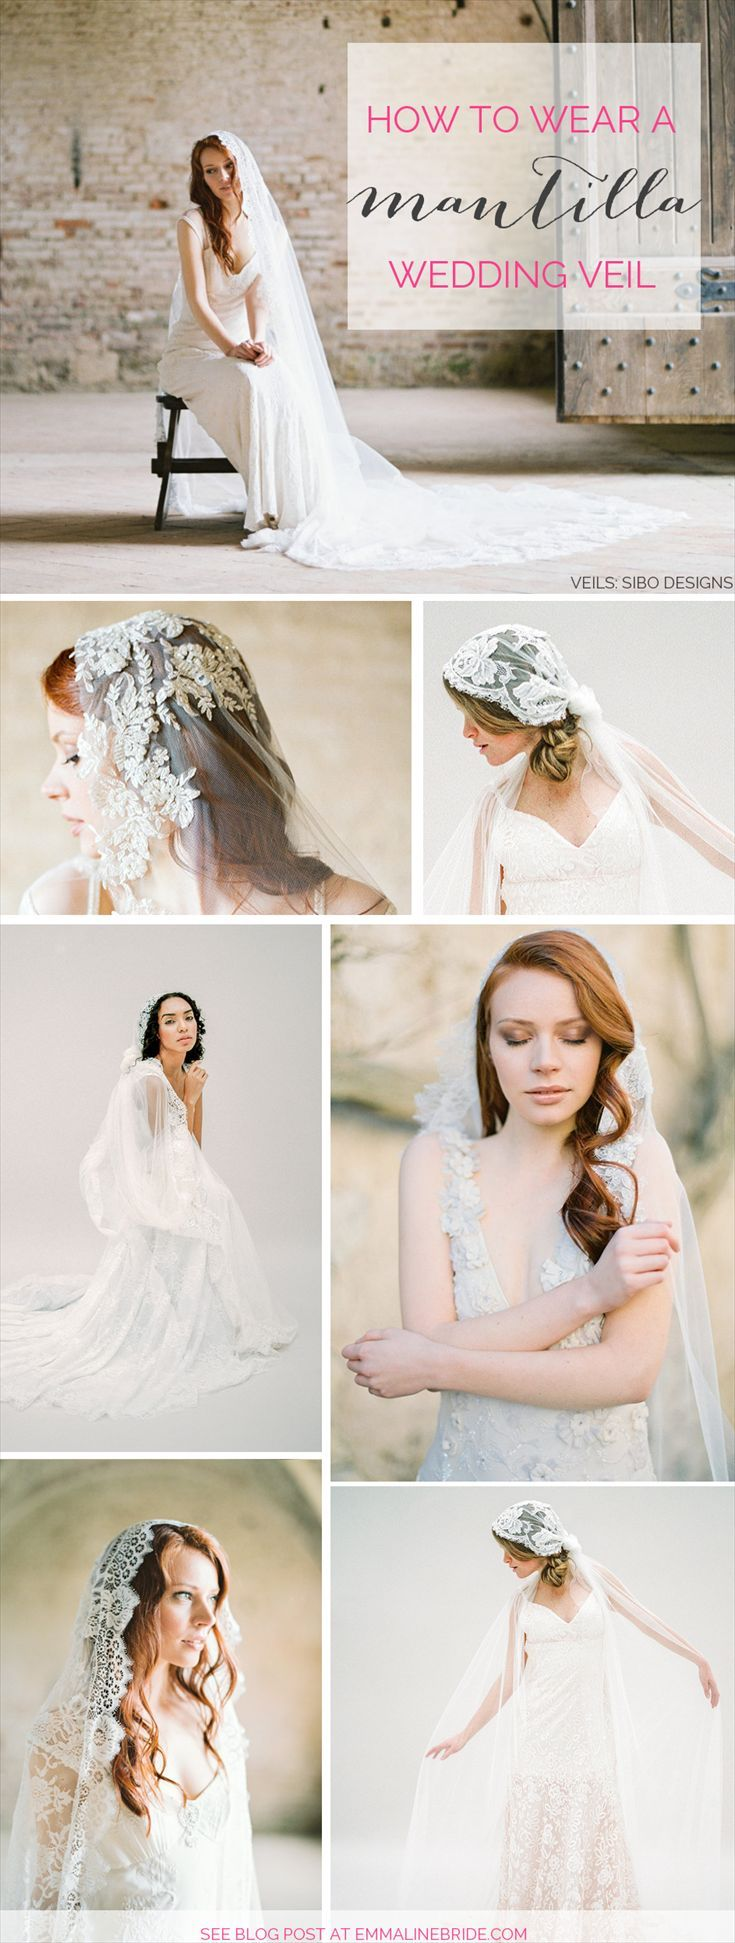 How to wear a mantilla wedding veil | veils by SIBO Designs